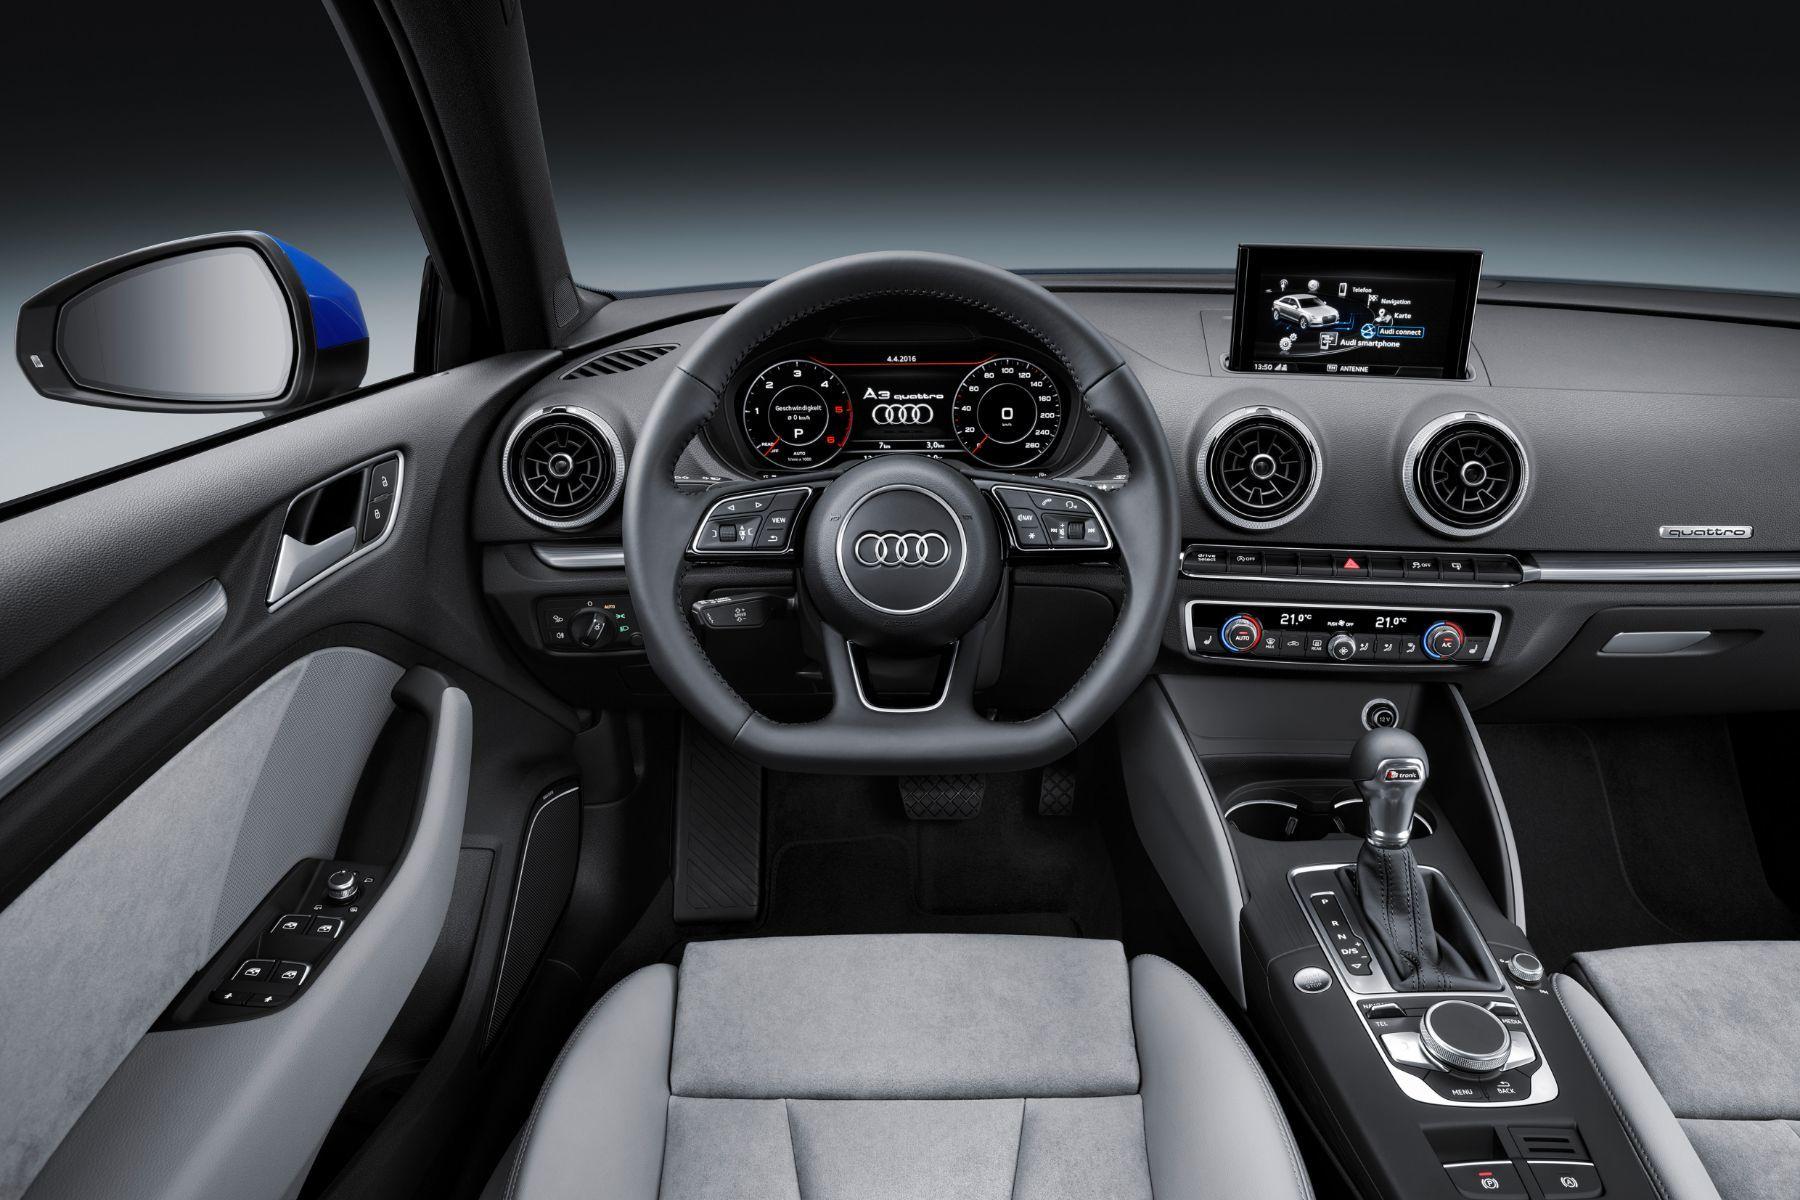 Kelebihan Audi A3 2018 Murah Berkualitas